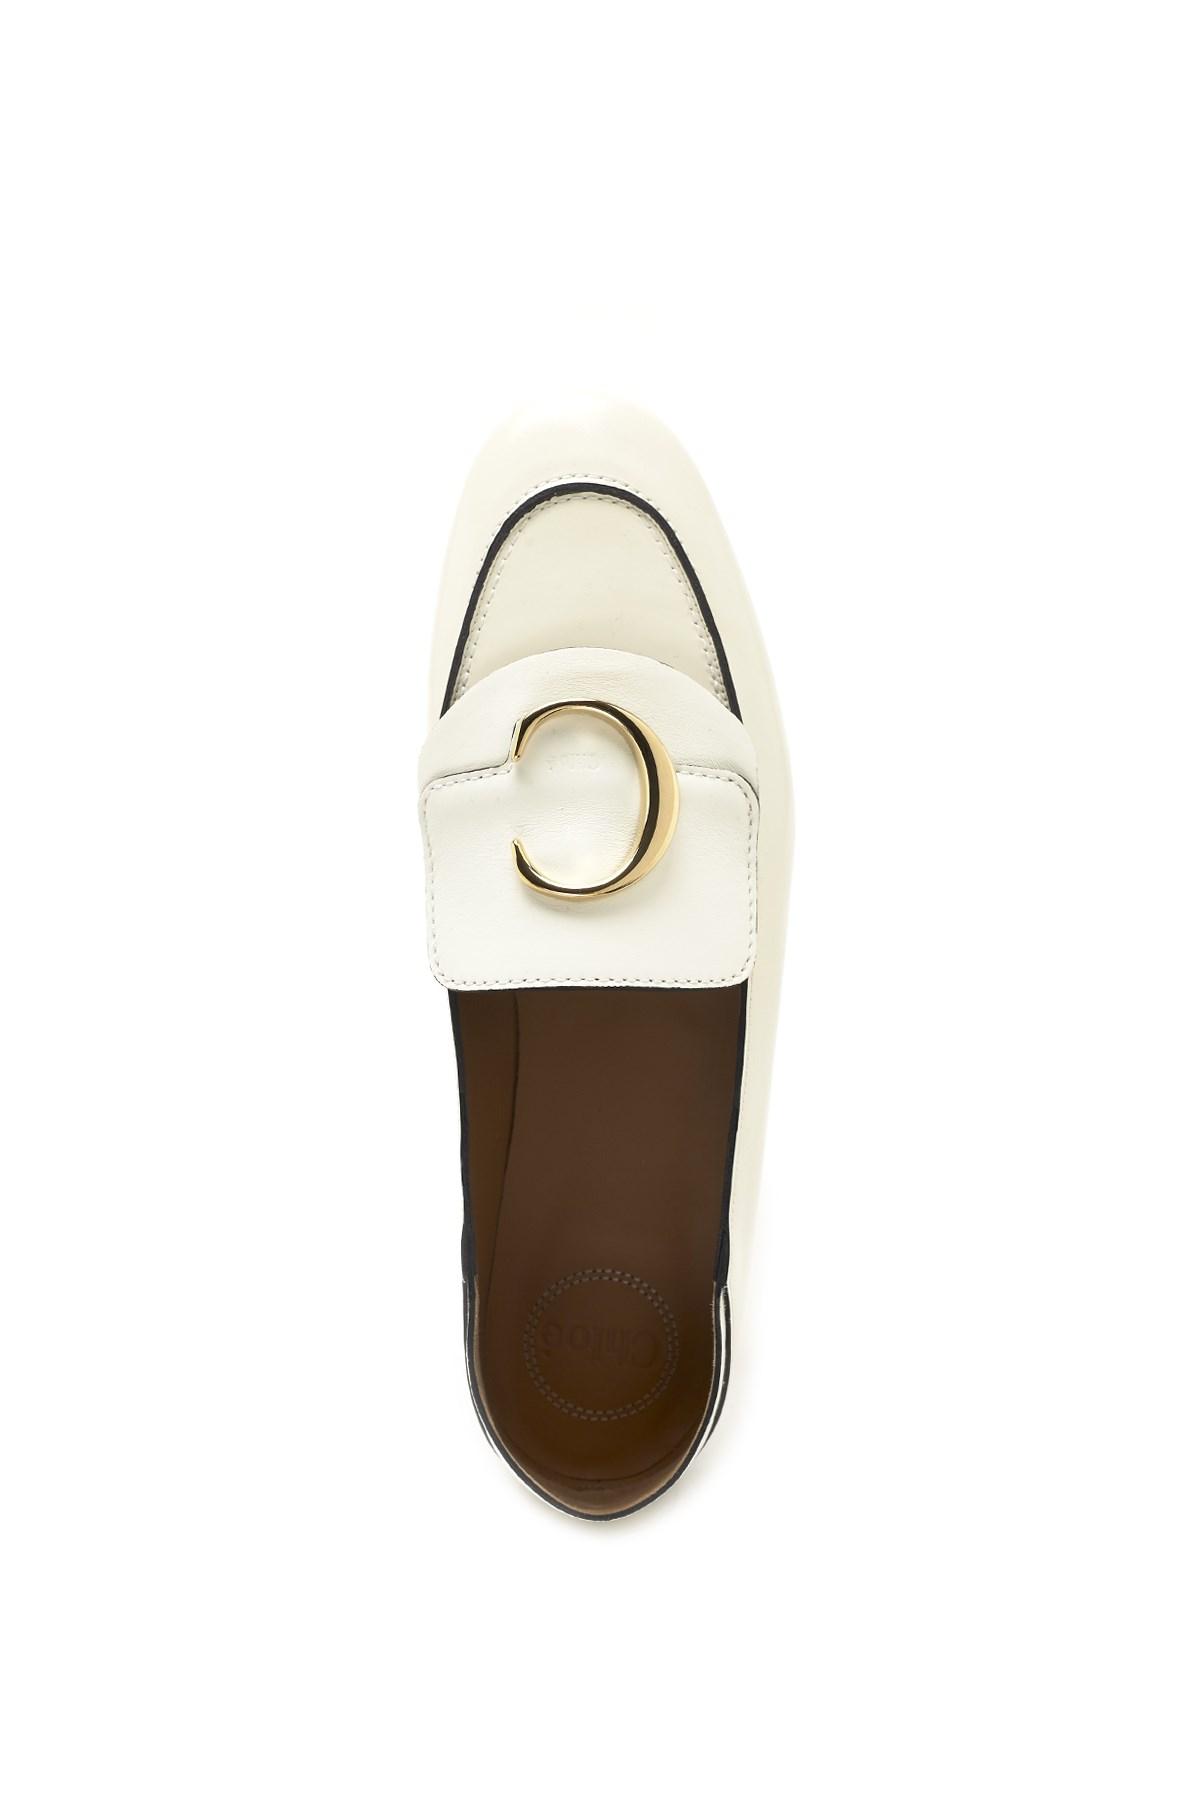 8d183ba32a7 chloé  Chloè  loafers available on julian-fashion.com - 62359